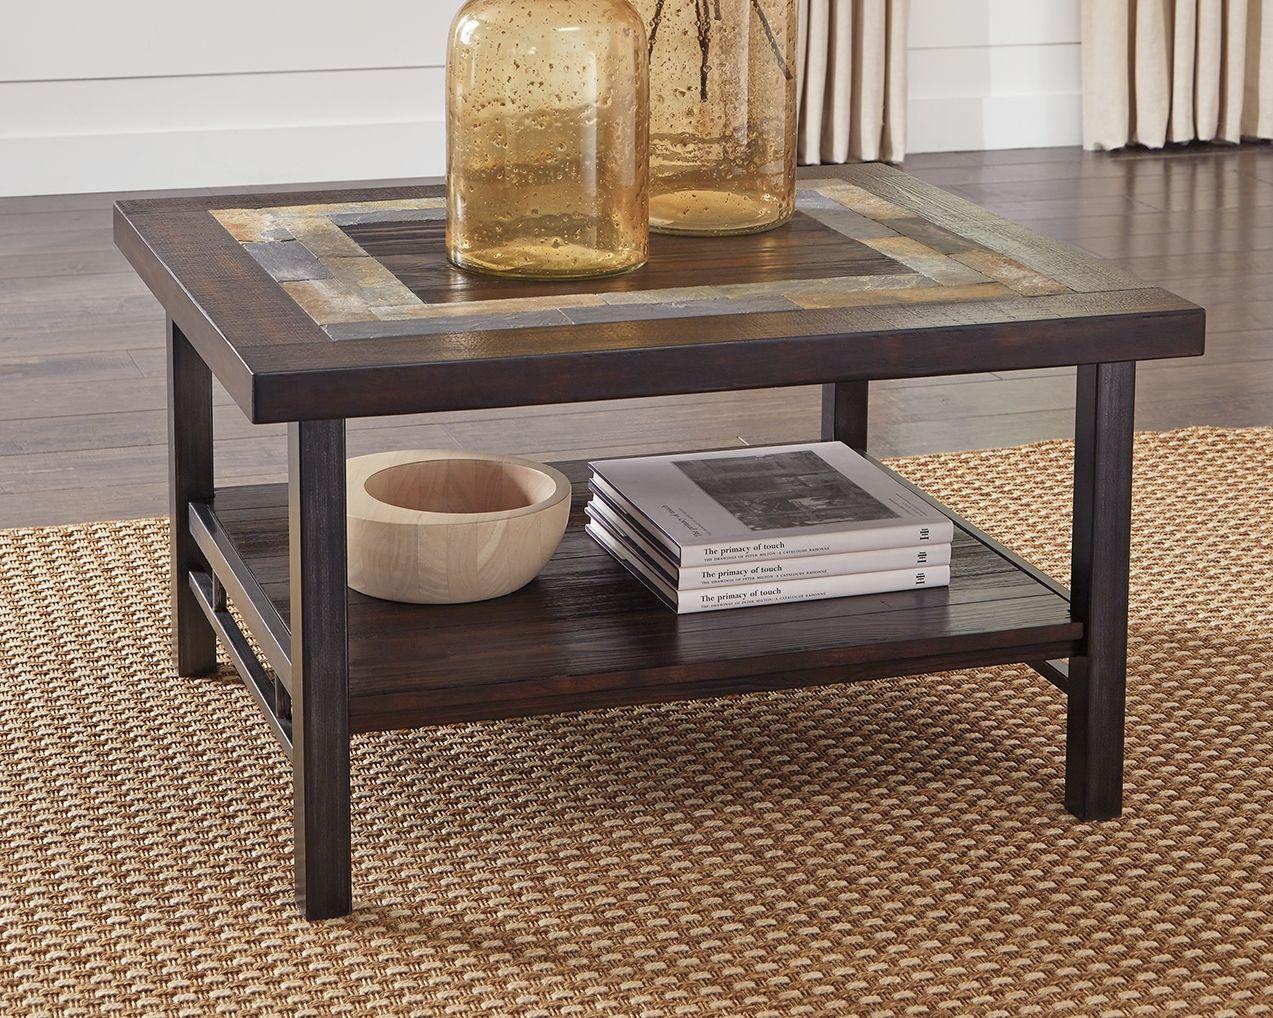 Gallivan Coffee Table Two Tone Brown Coffee Table Coffee Table Wood Decorating Coffee Tables [ 1018 x 1273 Pixel ]